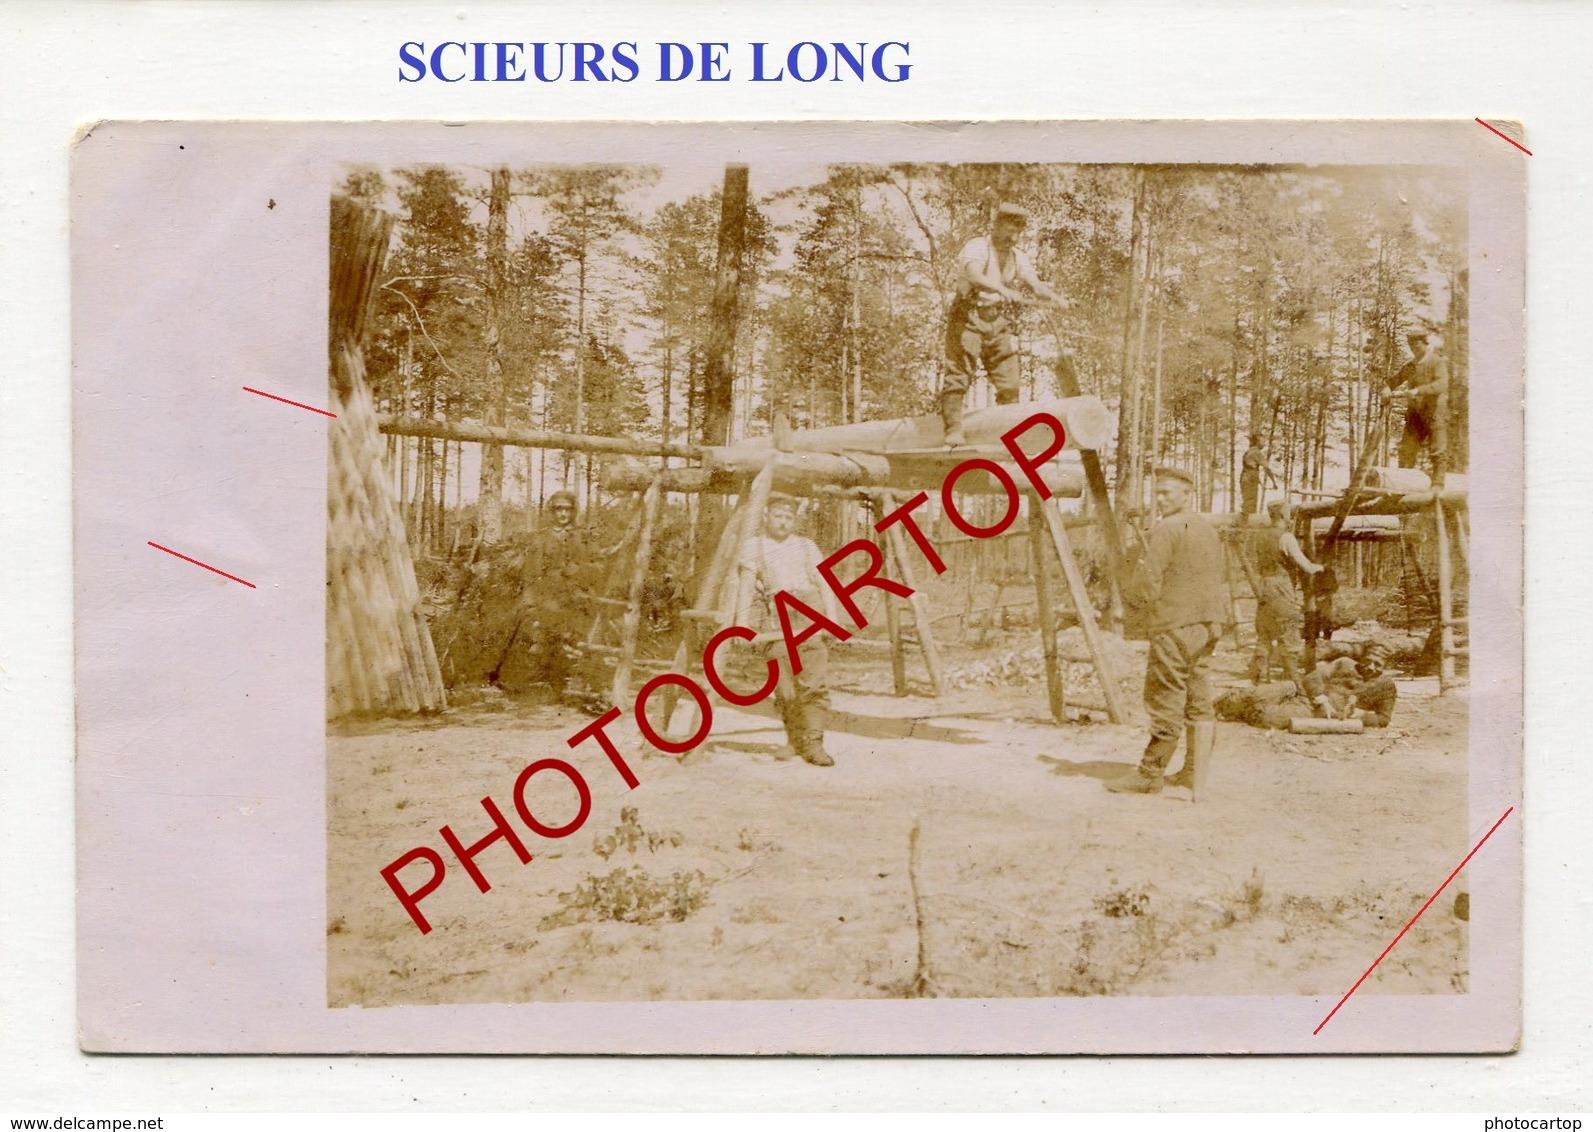 SCIEUR De LONG-Bois-Planches-Non Situee-CARTE PHOTO Allemande-Guerre 14-18-1WK-Militaria- - Oorlog 1914-18